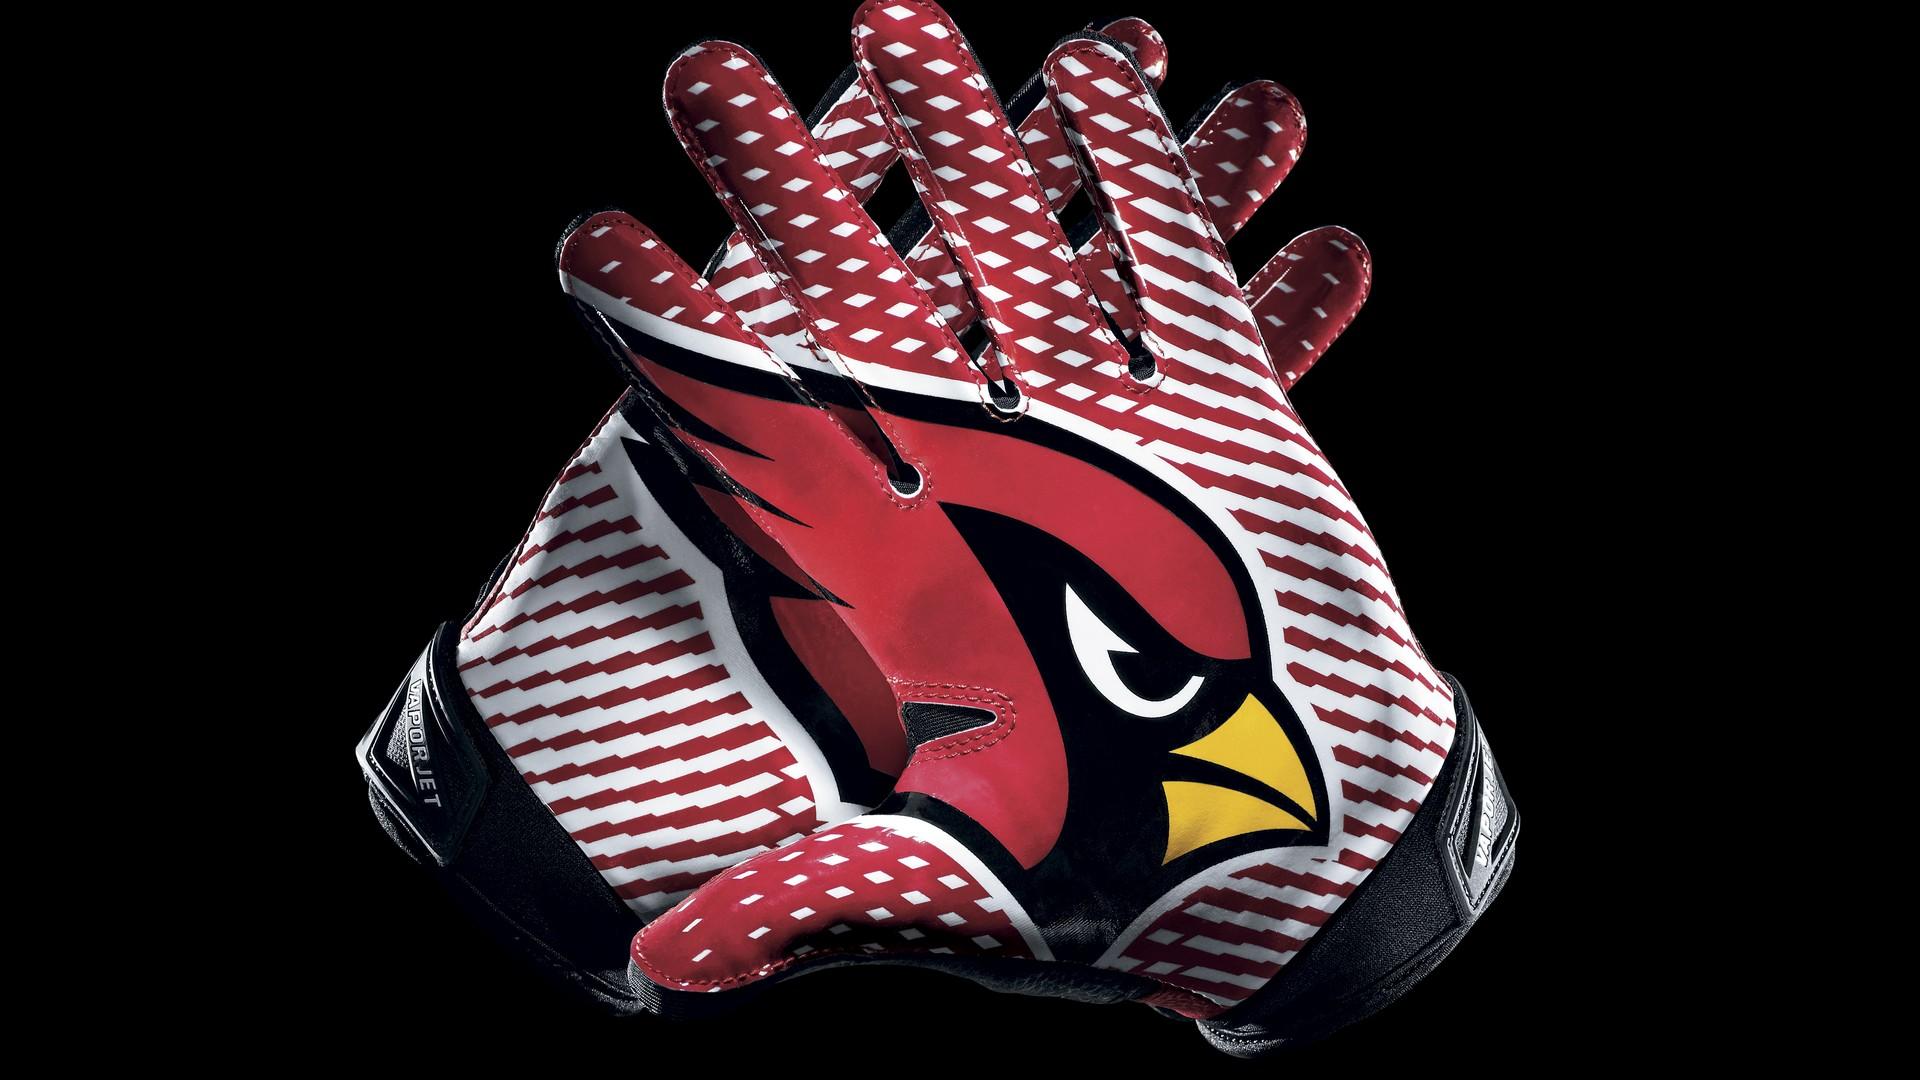 Seahawks Hd Wallpaper Wallpapers Hd Arizona Cardinals 2019 Nfl Football Wallpapers